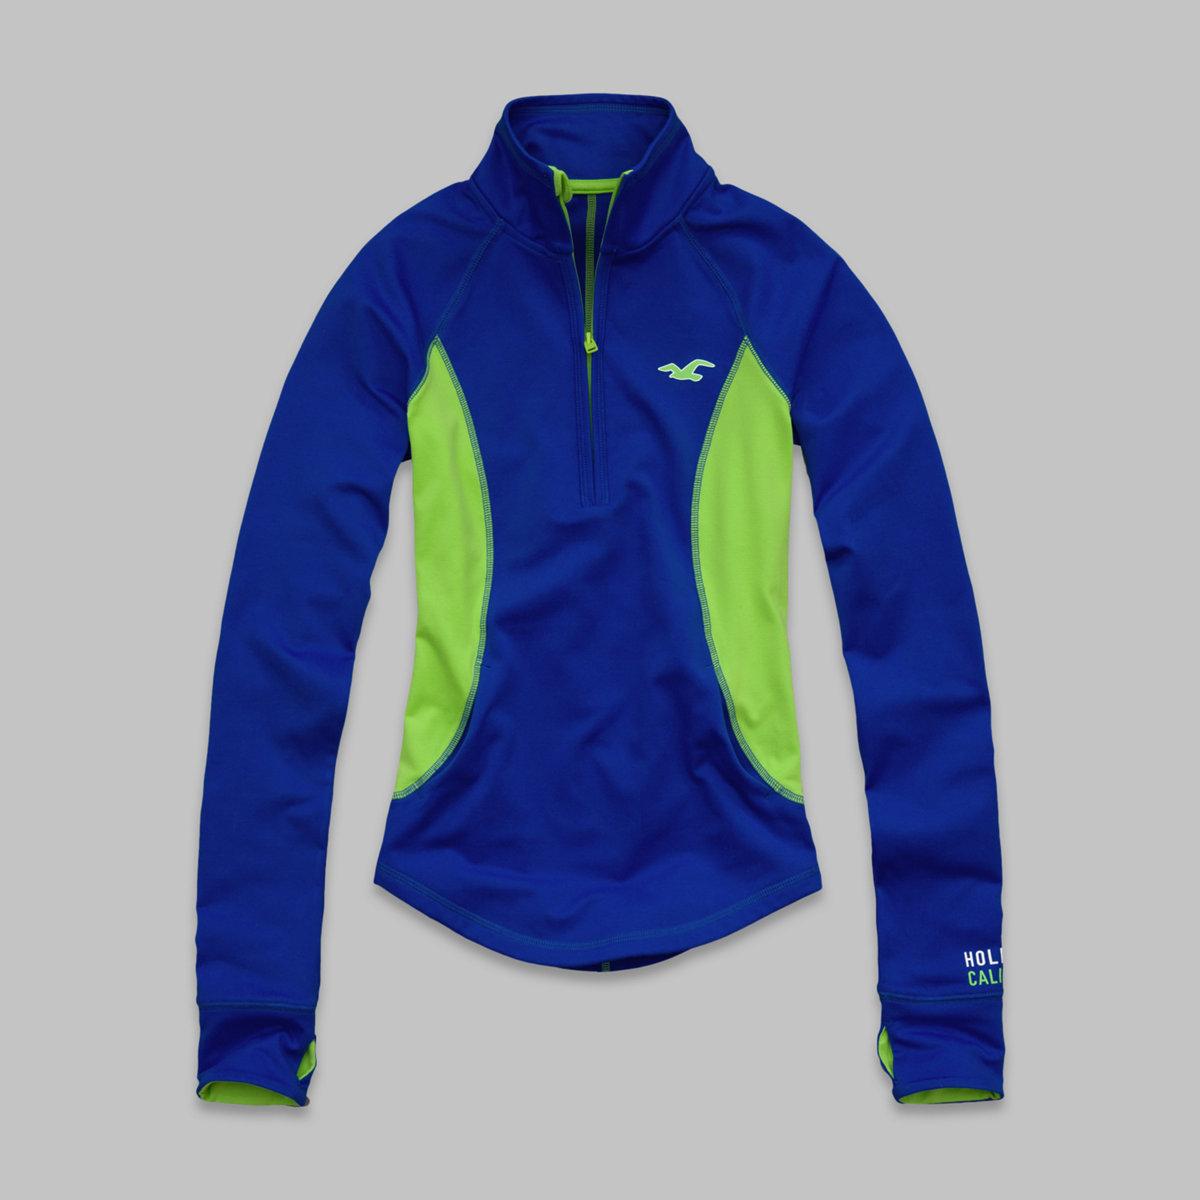 Hollister Sport Sweatshirt